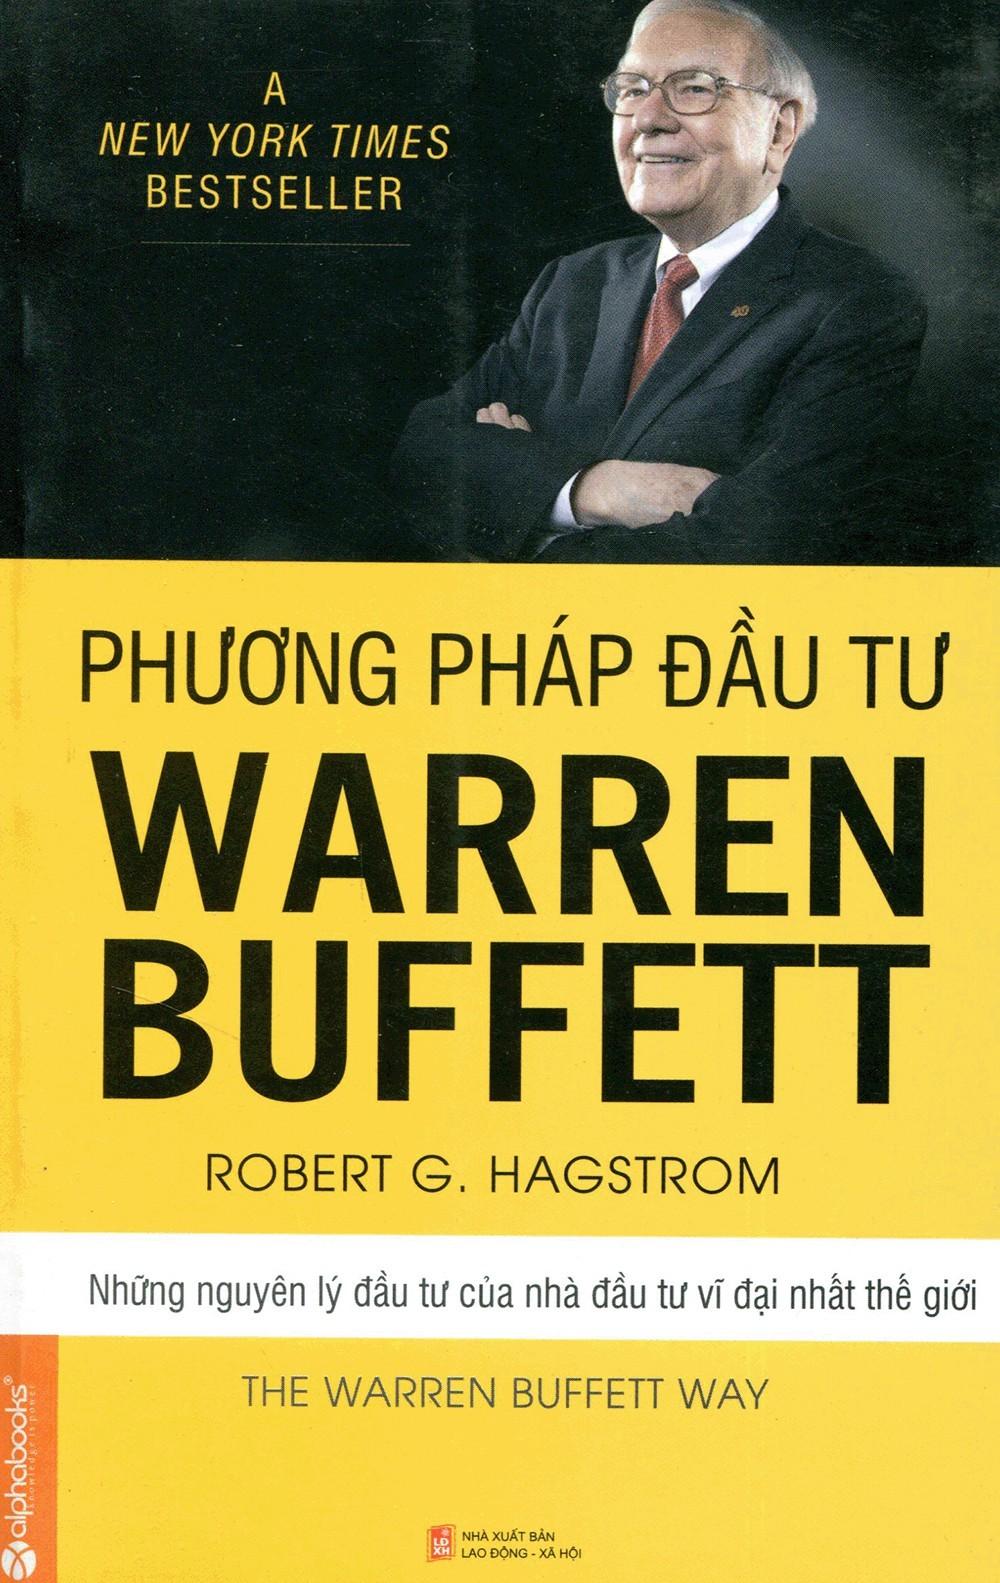 phuong-phap-dau-tu-warren-buffett_1.jpg